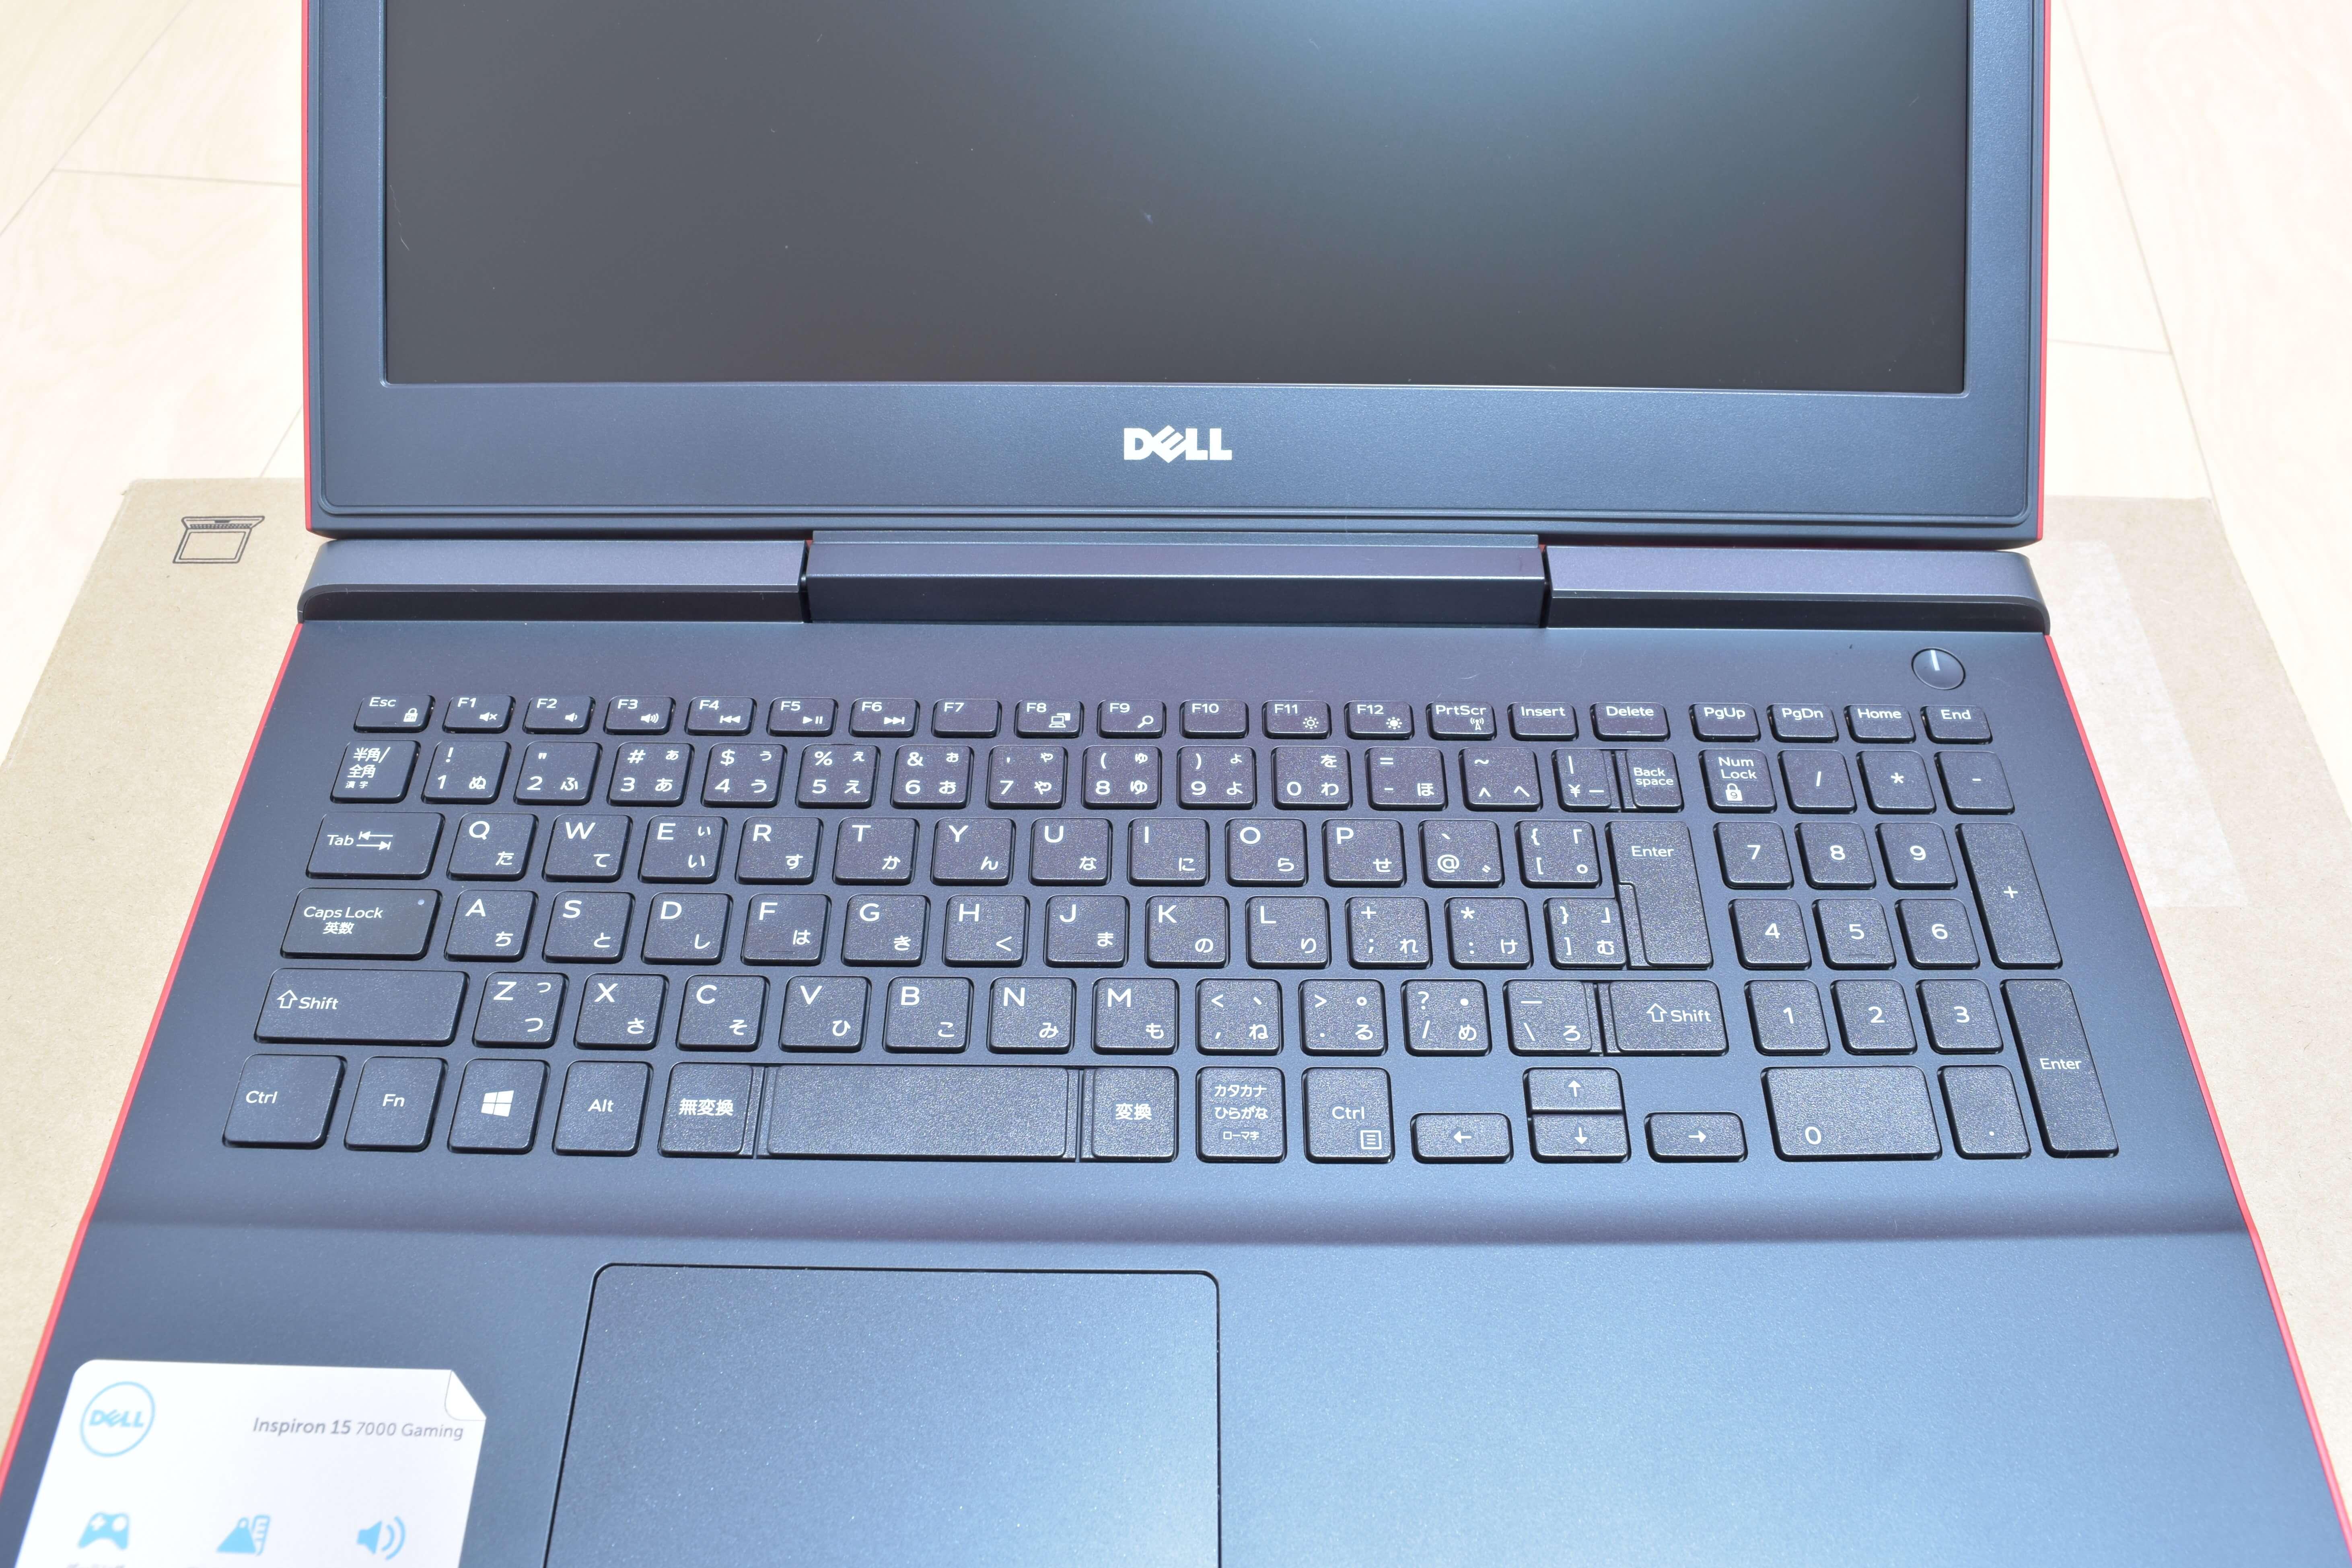 Dell / Inspiron 15 7000 (7567) Gaming プラチナのキーボード